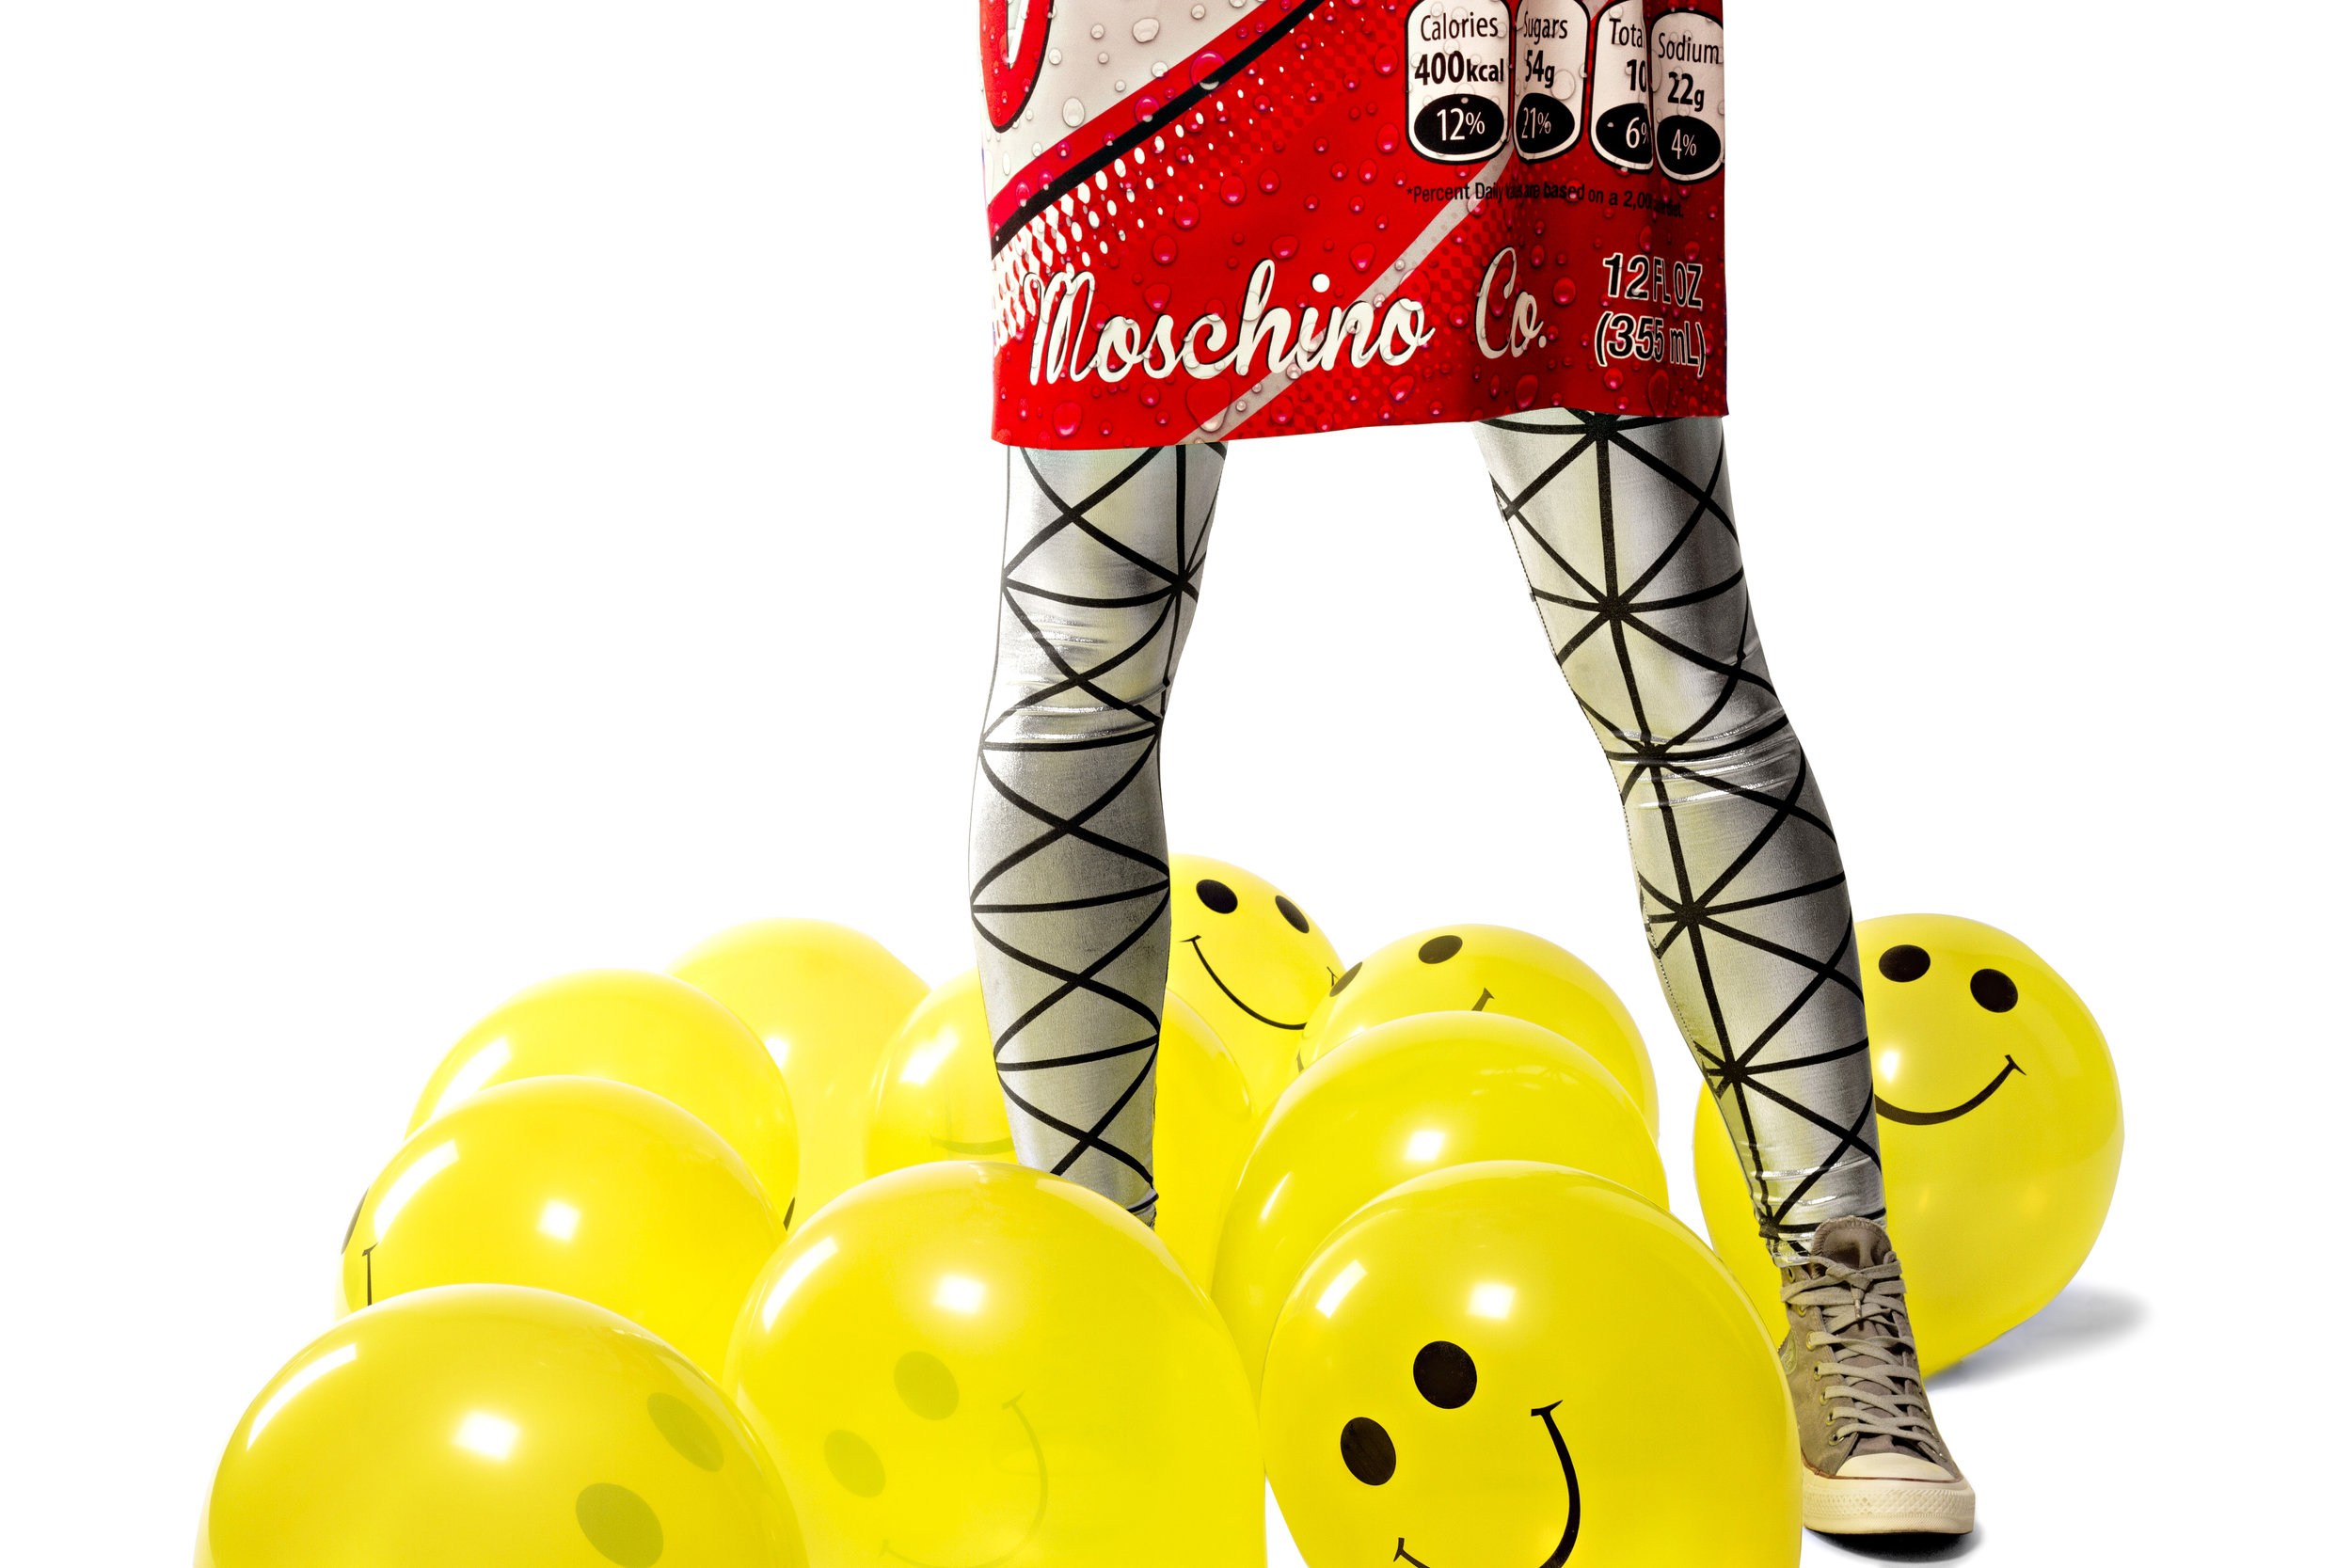 Shirt-Dress  Moschino D'Adélia Store,Leggings  Production's own ,Sneakers  Converse ,Balloons,  Mascarilha.pt